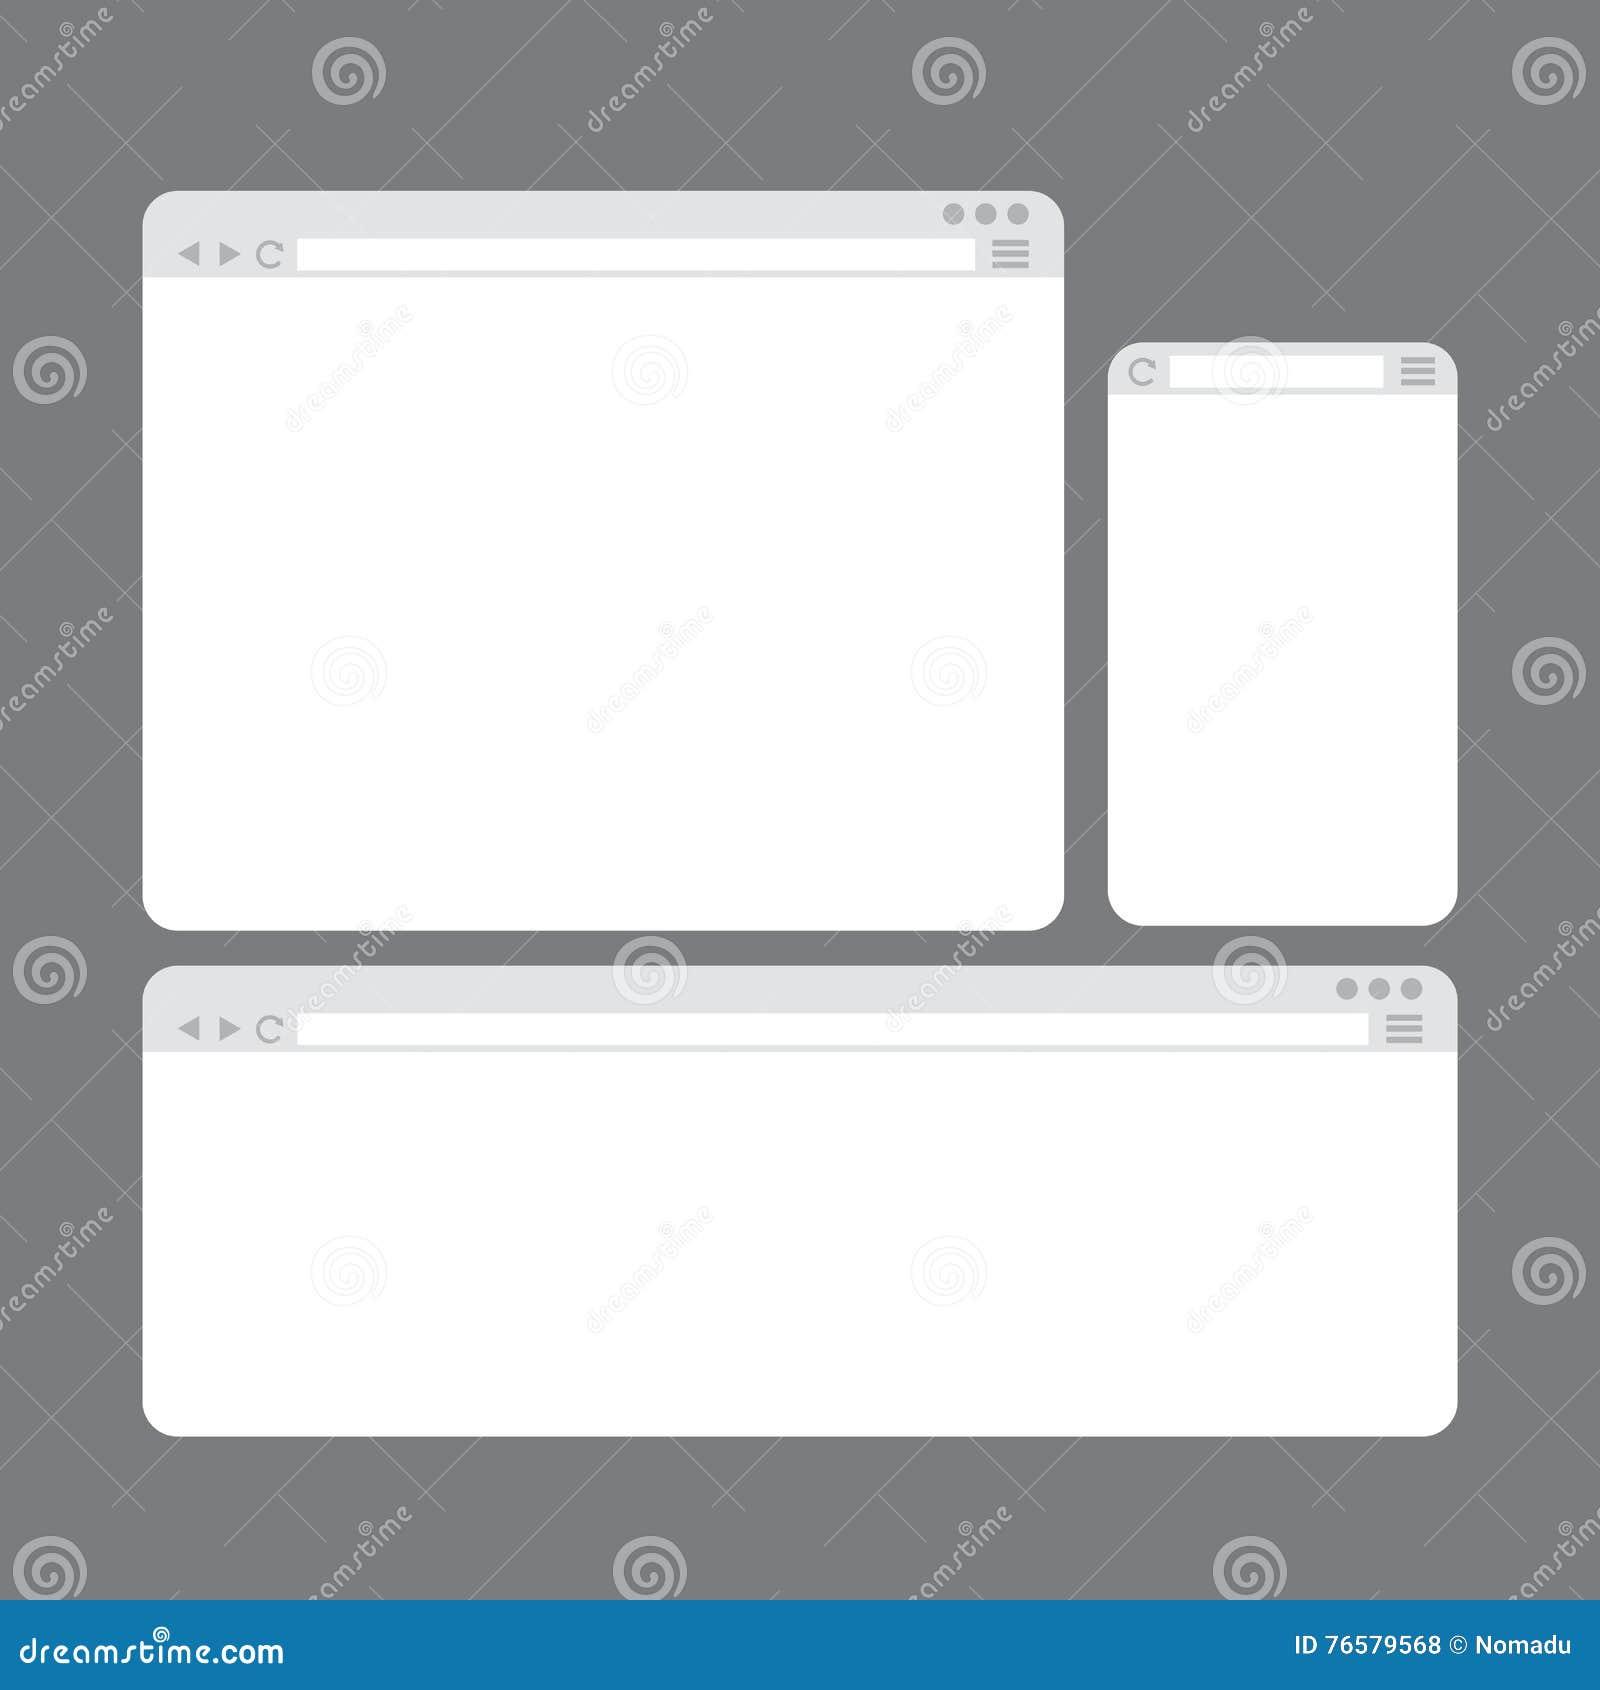 Txt Descargar Internet Browser Window Templates Set Stock